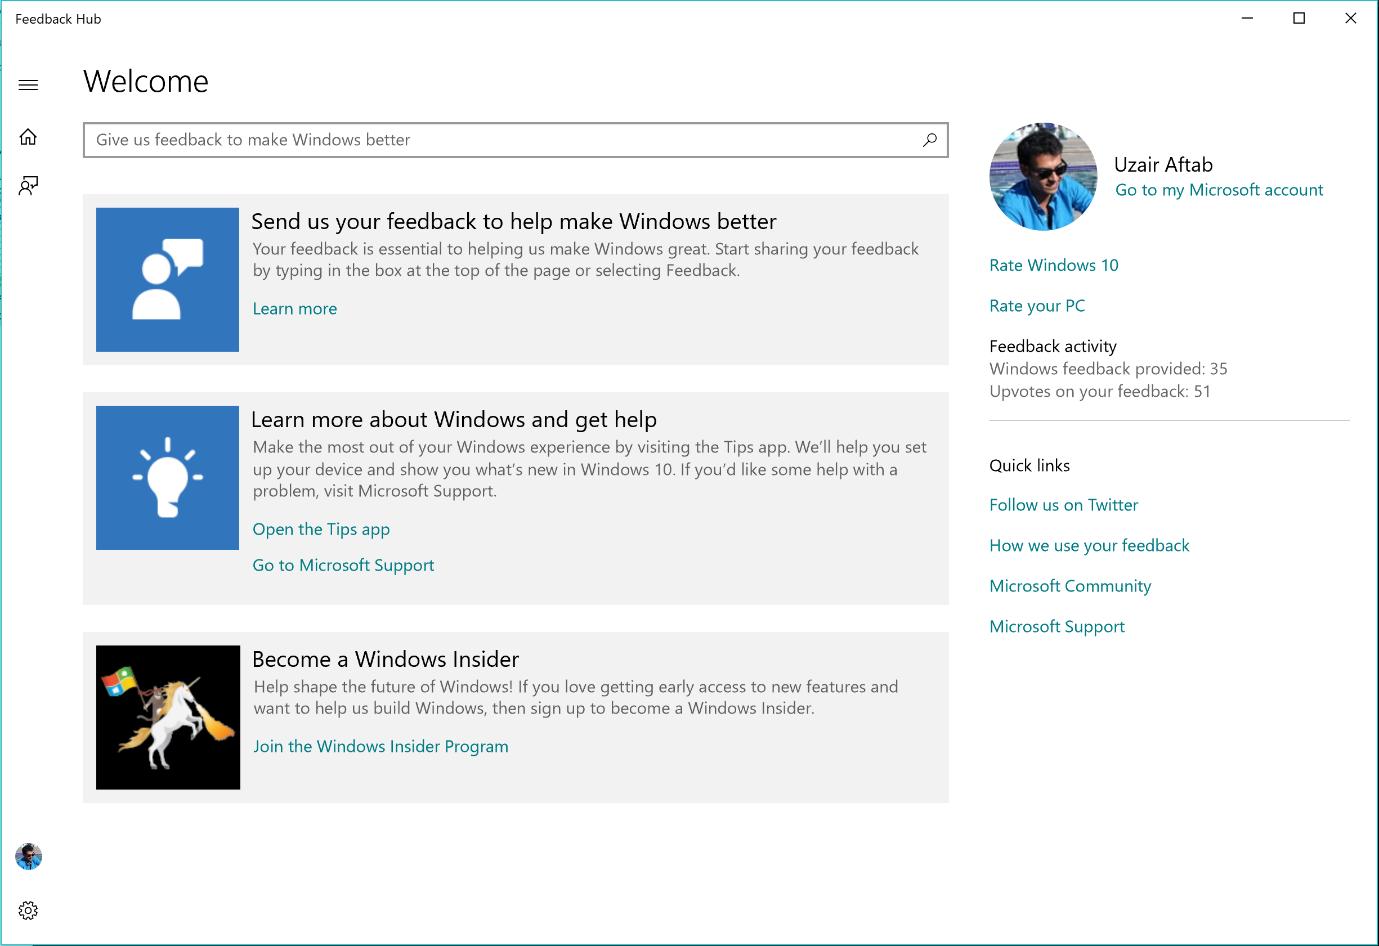 Screenshot of Feedback Hub's Welcome page